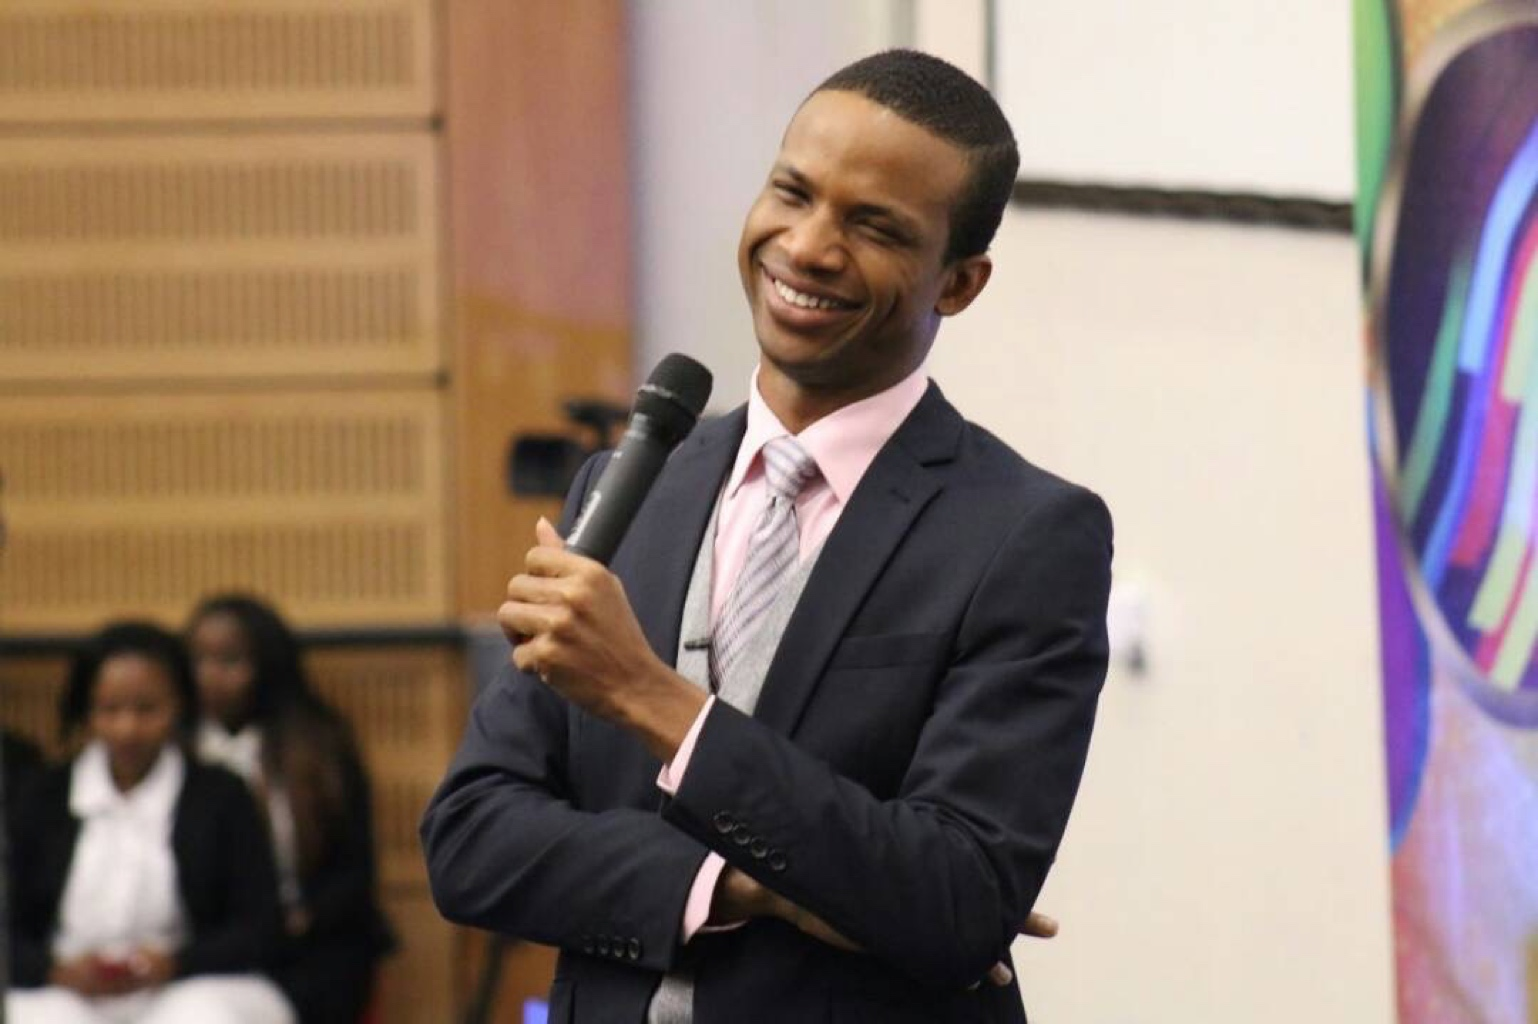 Happy Birthday Pastor Sir!!! Thank